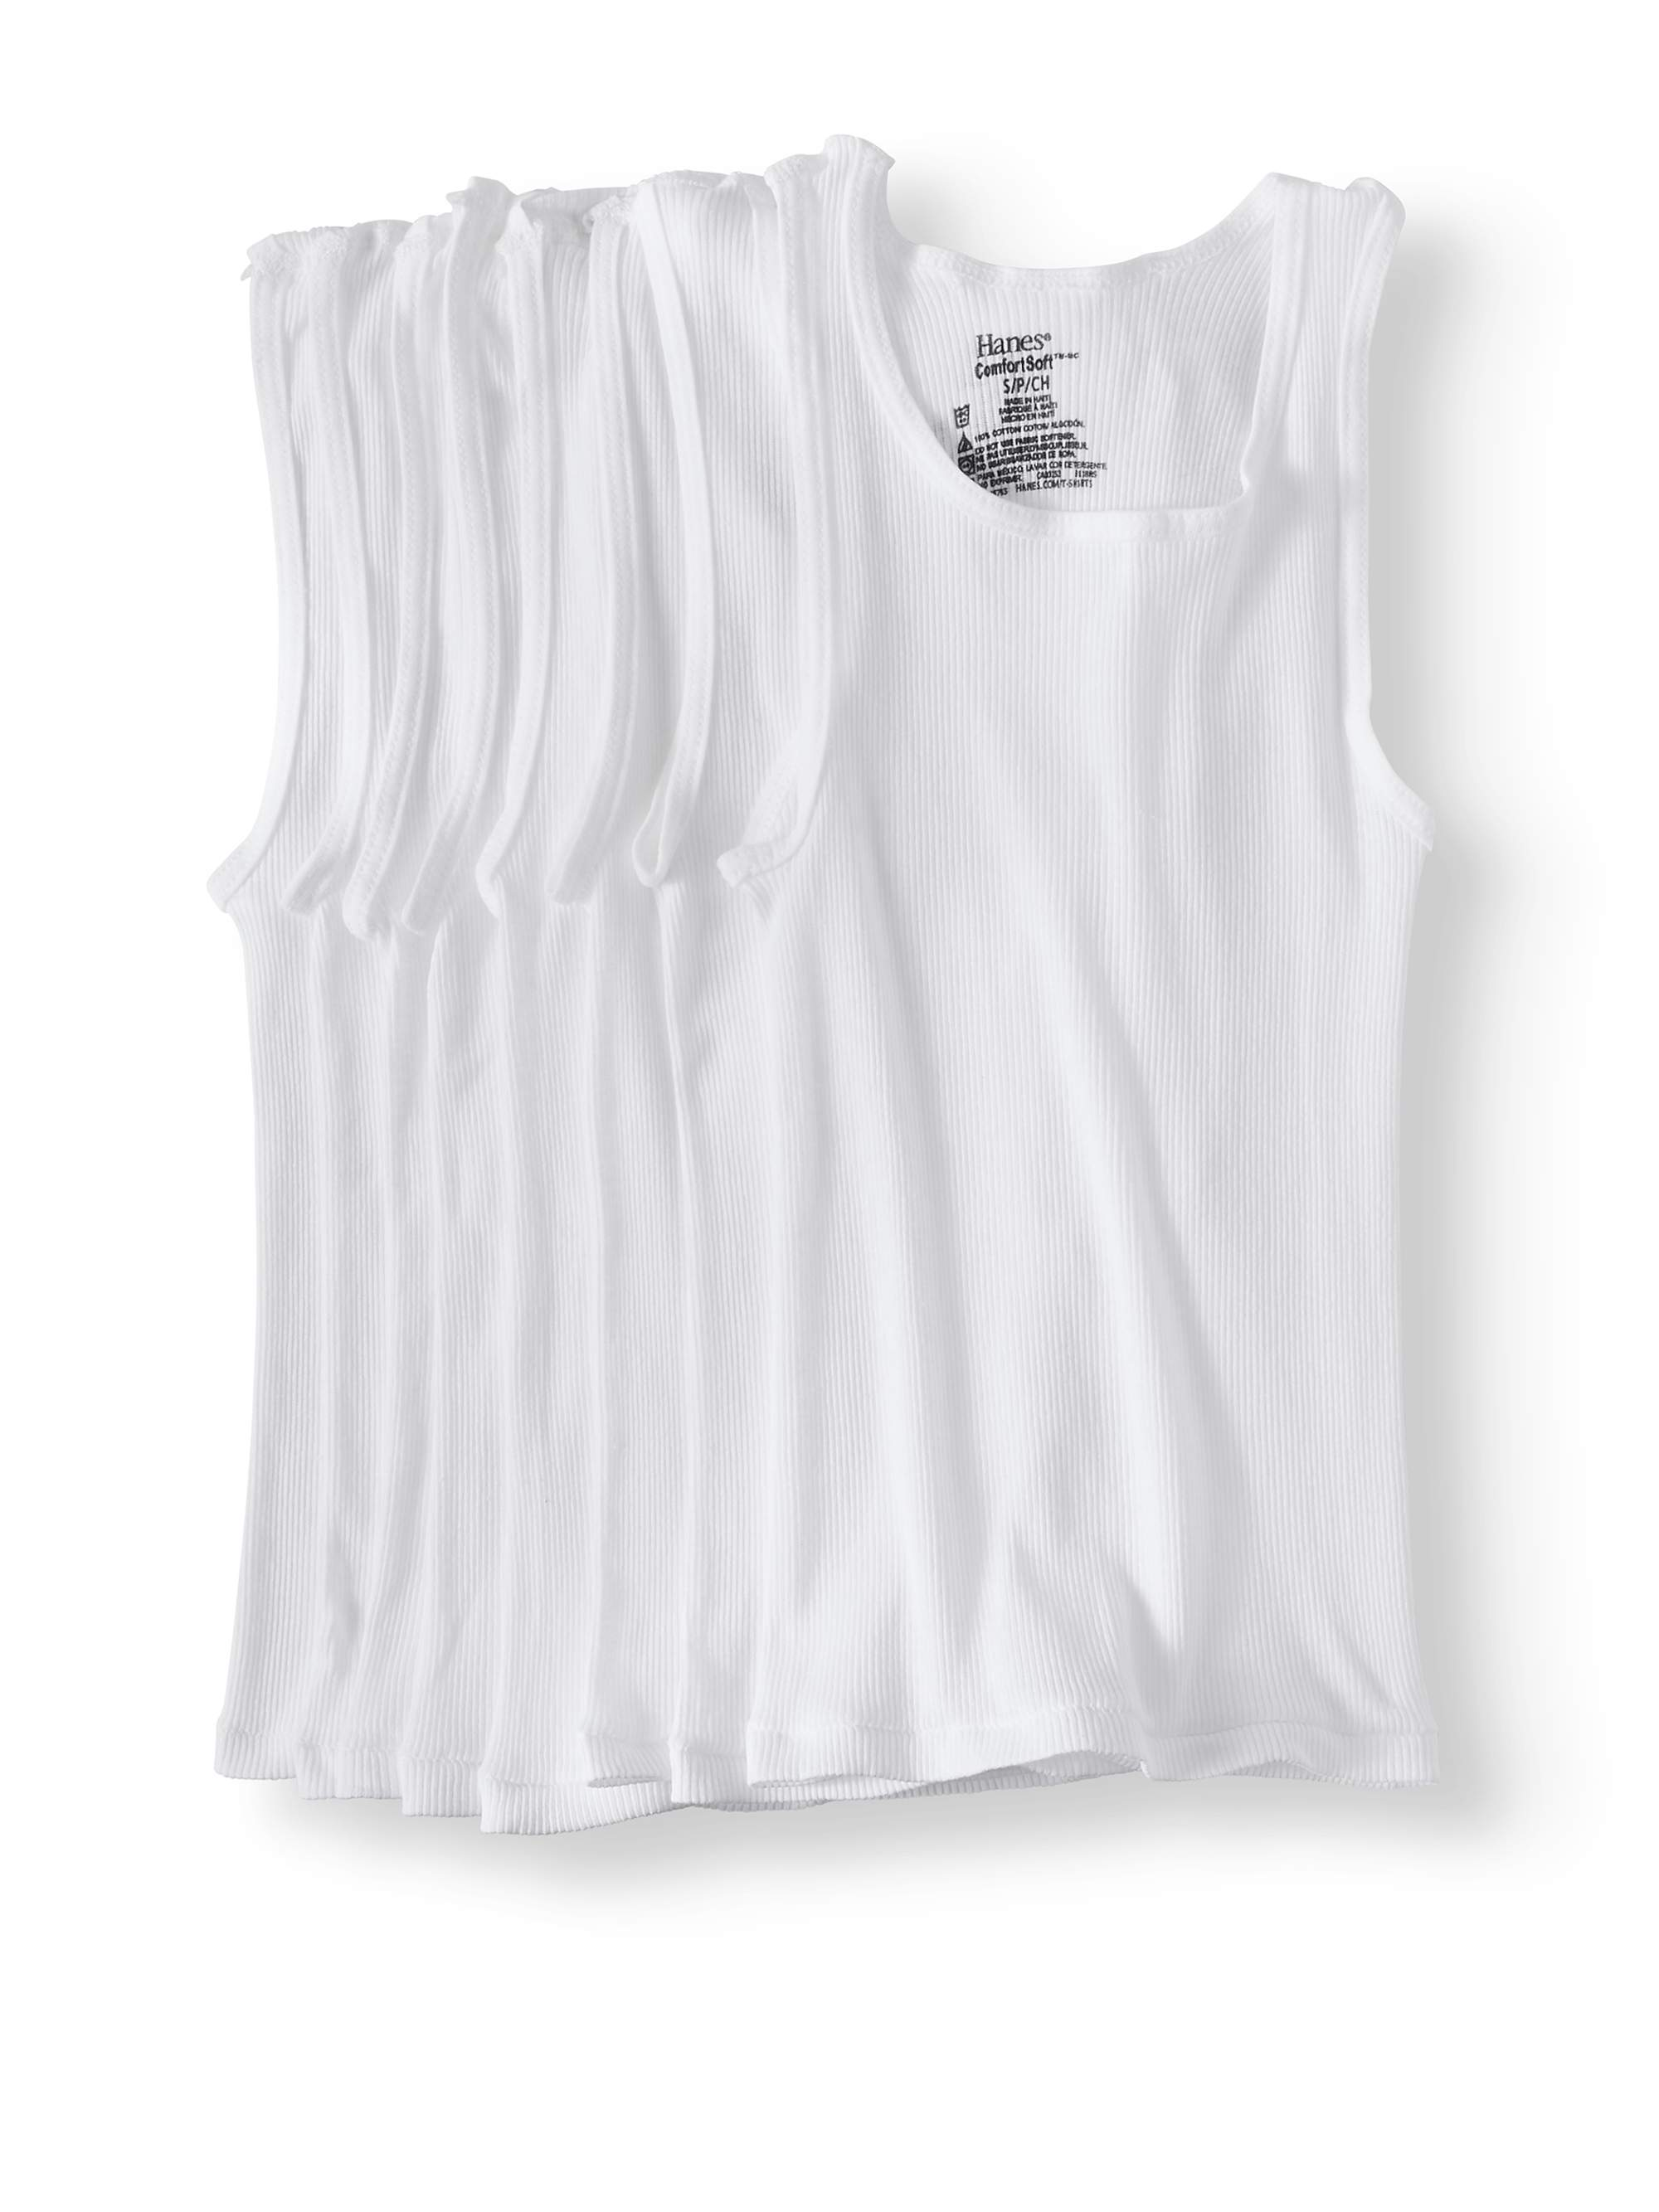 Fruit of the Loom Boys 8Pack White Crew-Neck T-Shirts Kids Undershirts